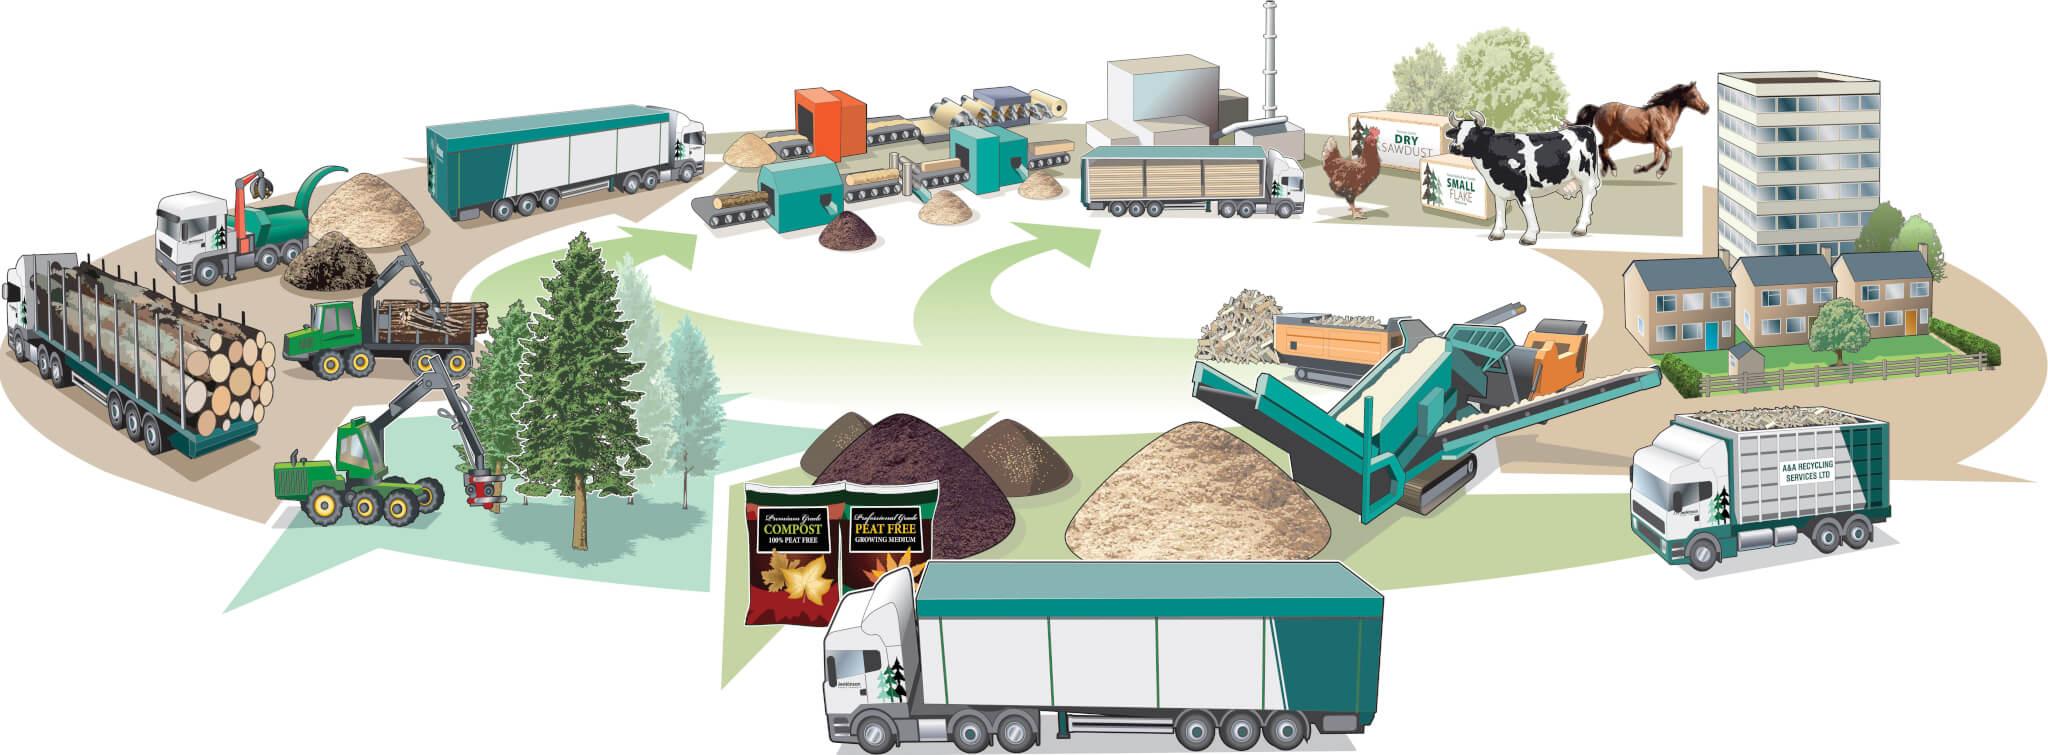 CRJ Services & Matpro Machinery